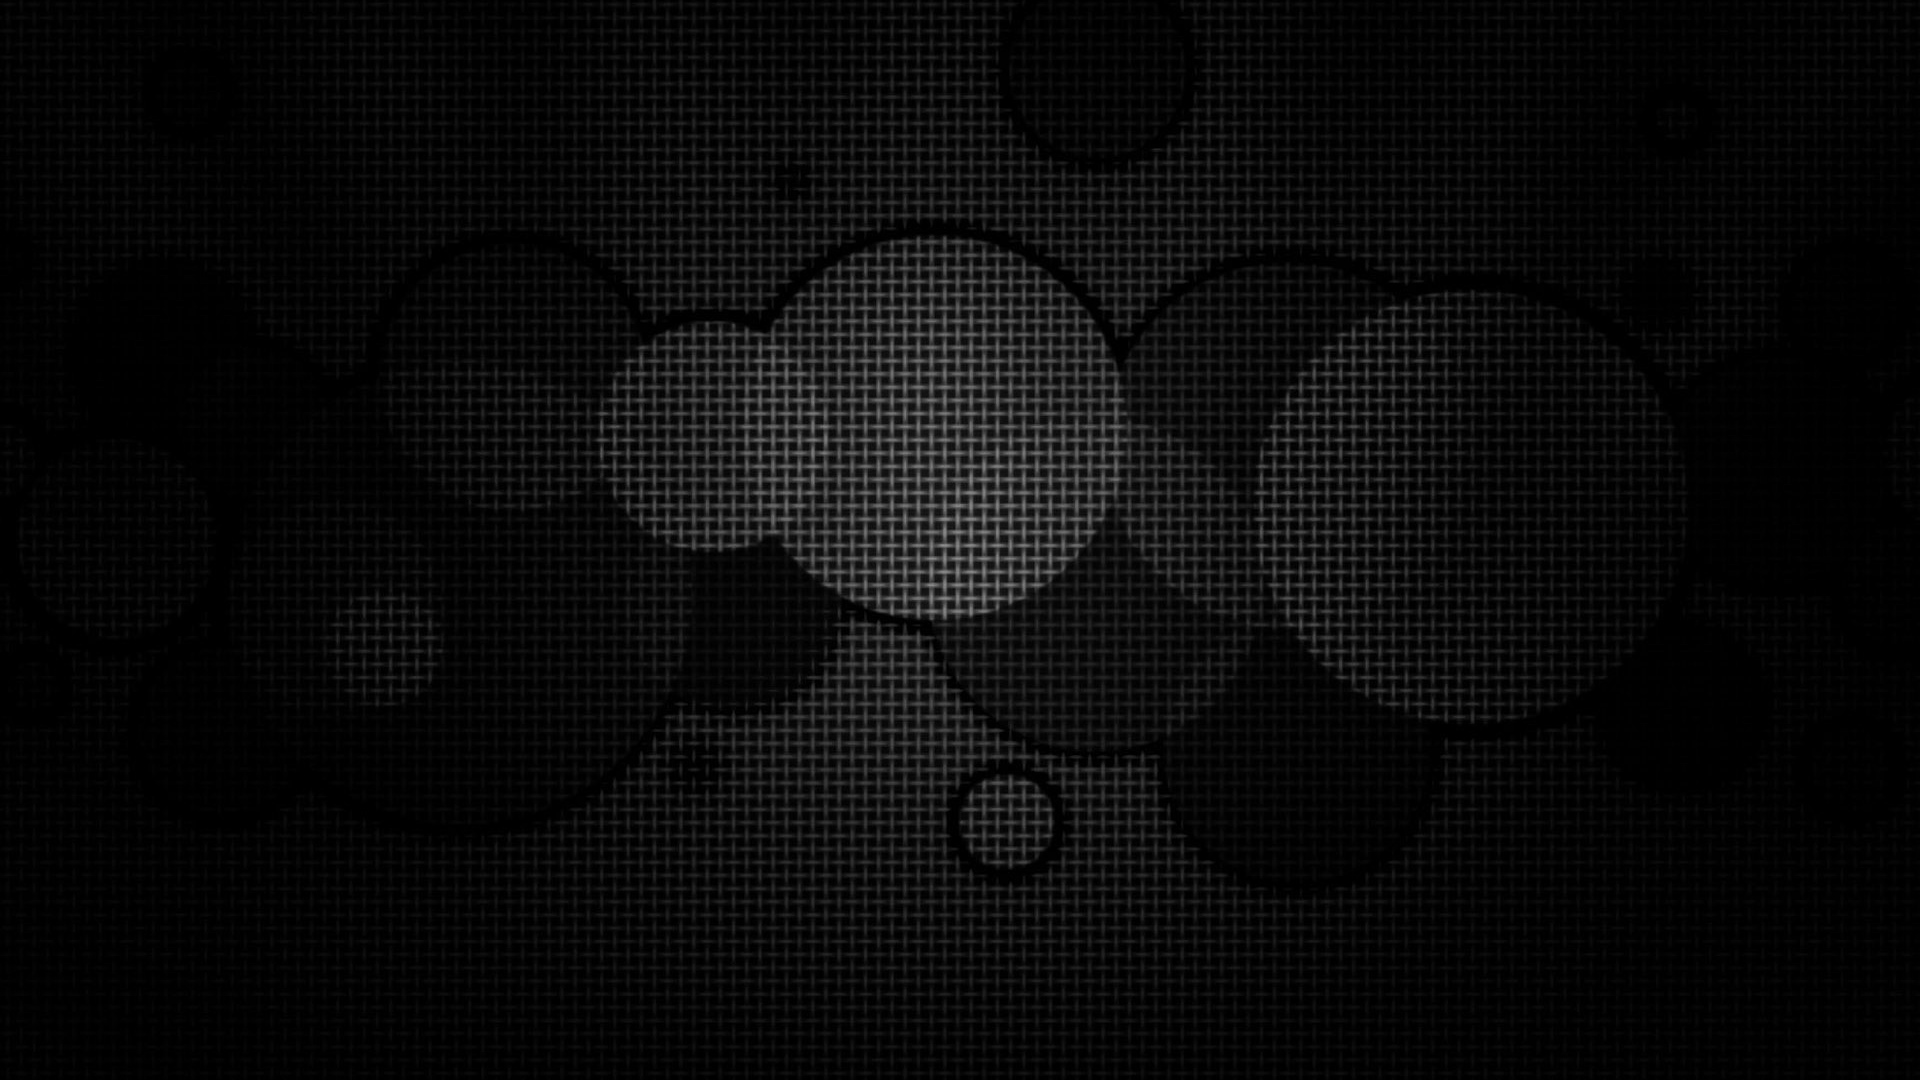 Black Abstract desktop background free